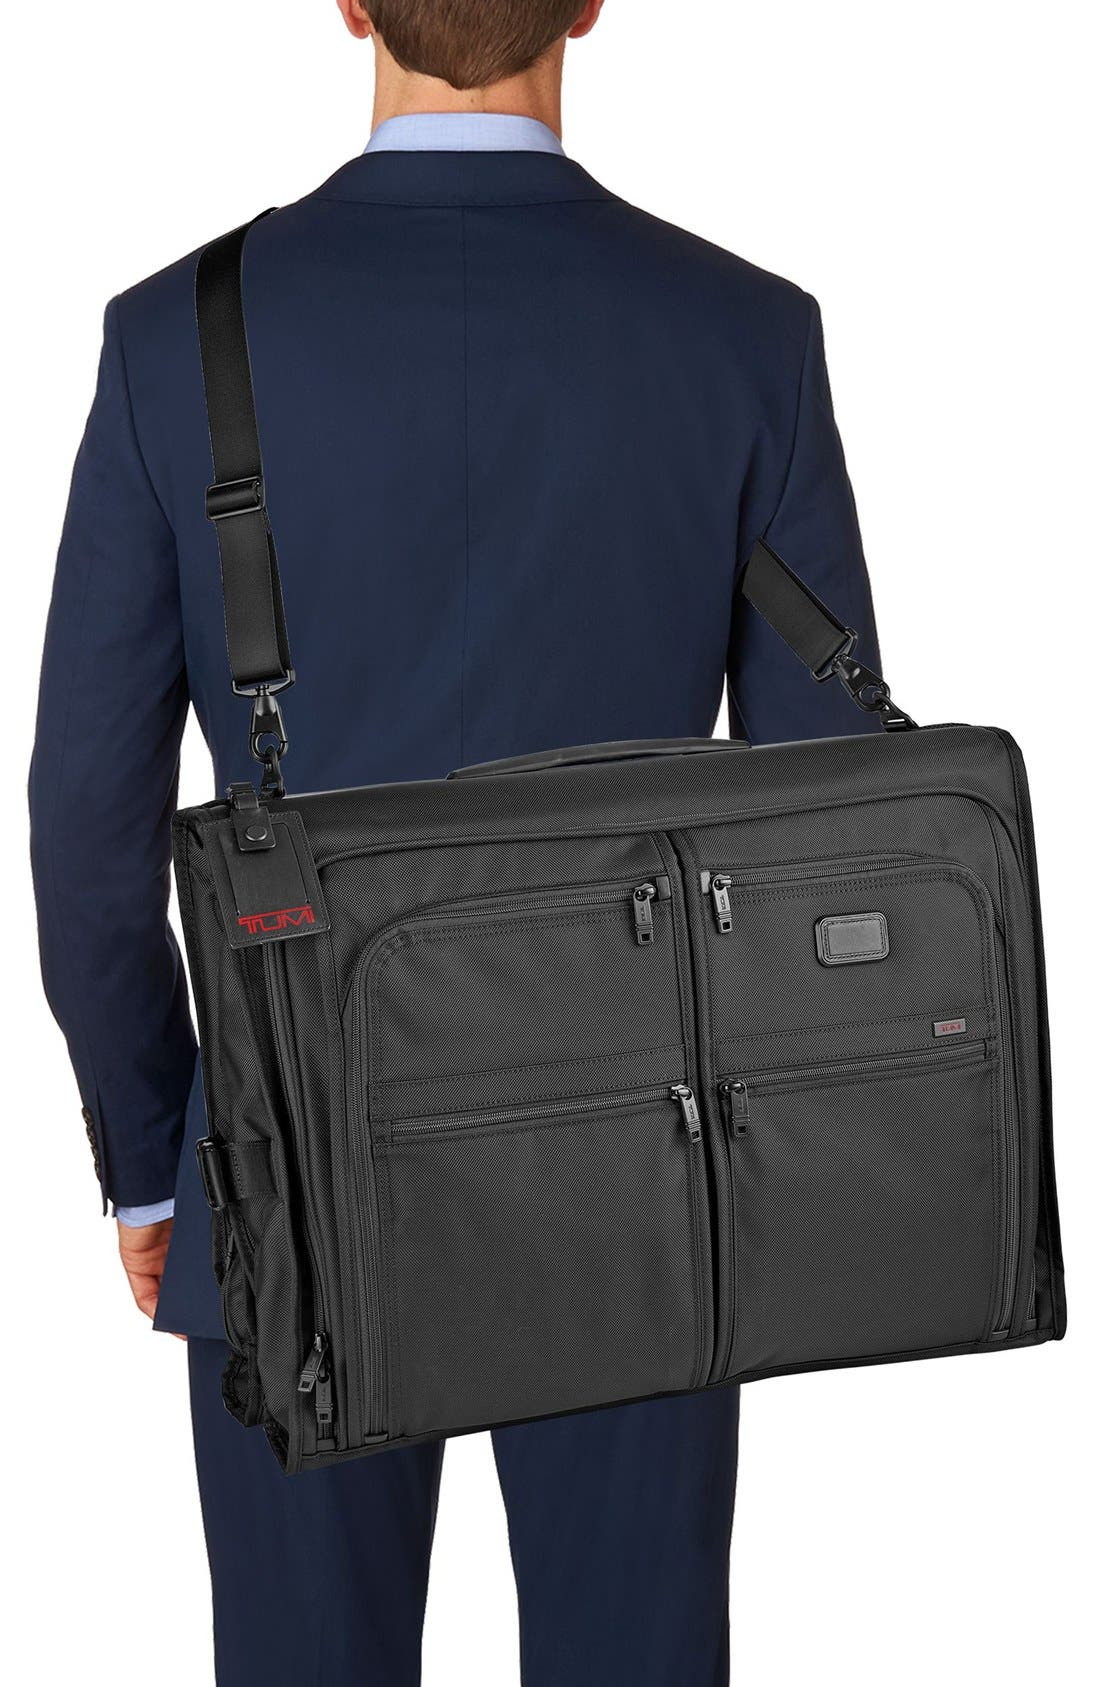 Alpha 2 Classic Garment Bag,                             Alternate thumbnail 4, color,                             Black